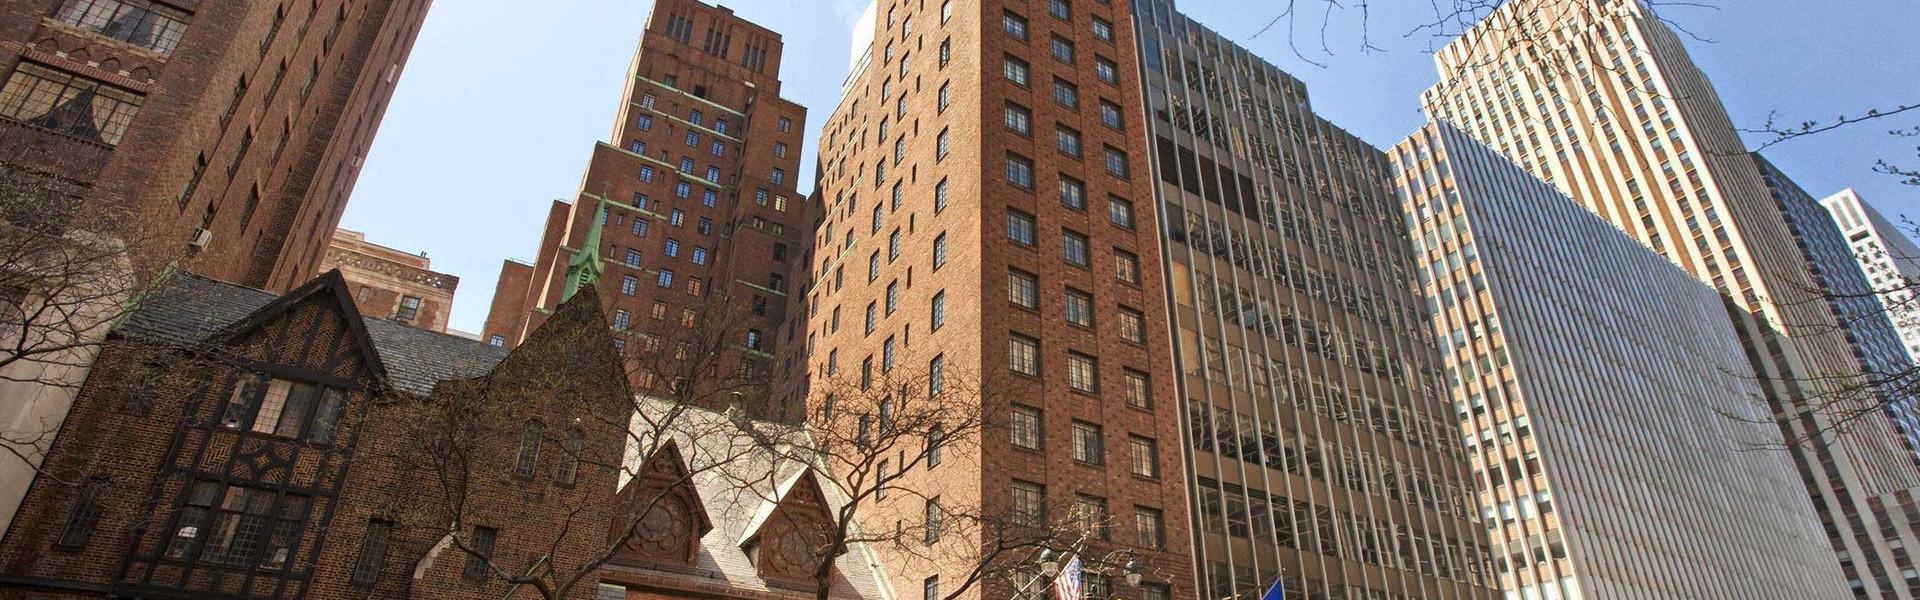 Midtown Manhattan Hotels | Hotels Near Midtown East | Westgate New York City